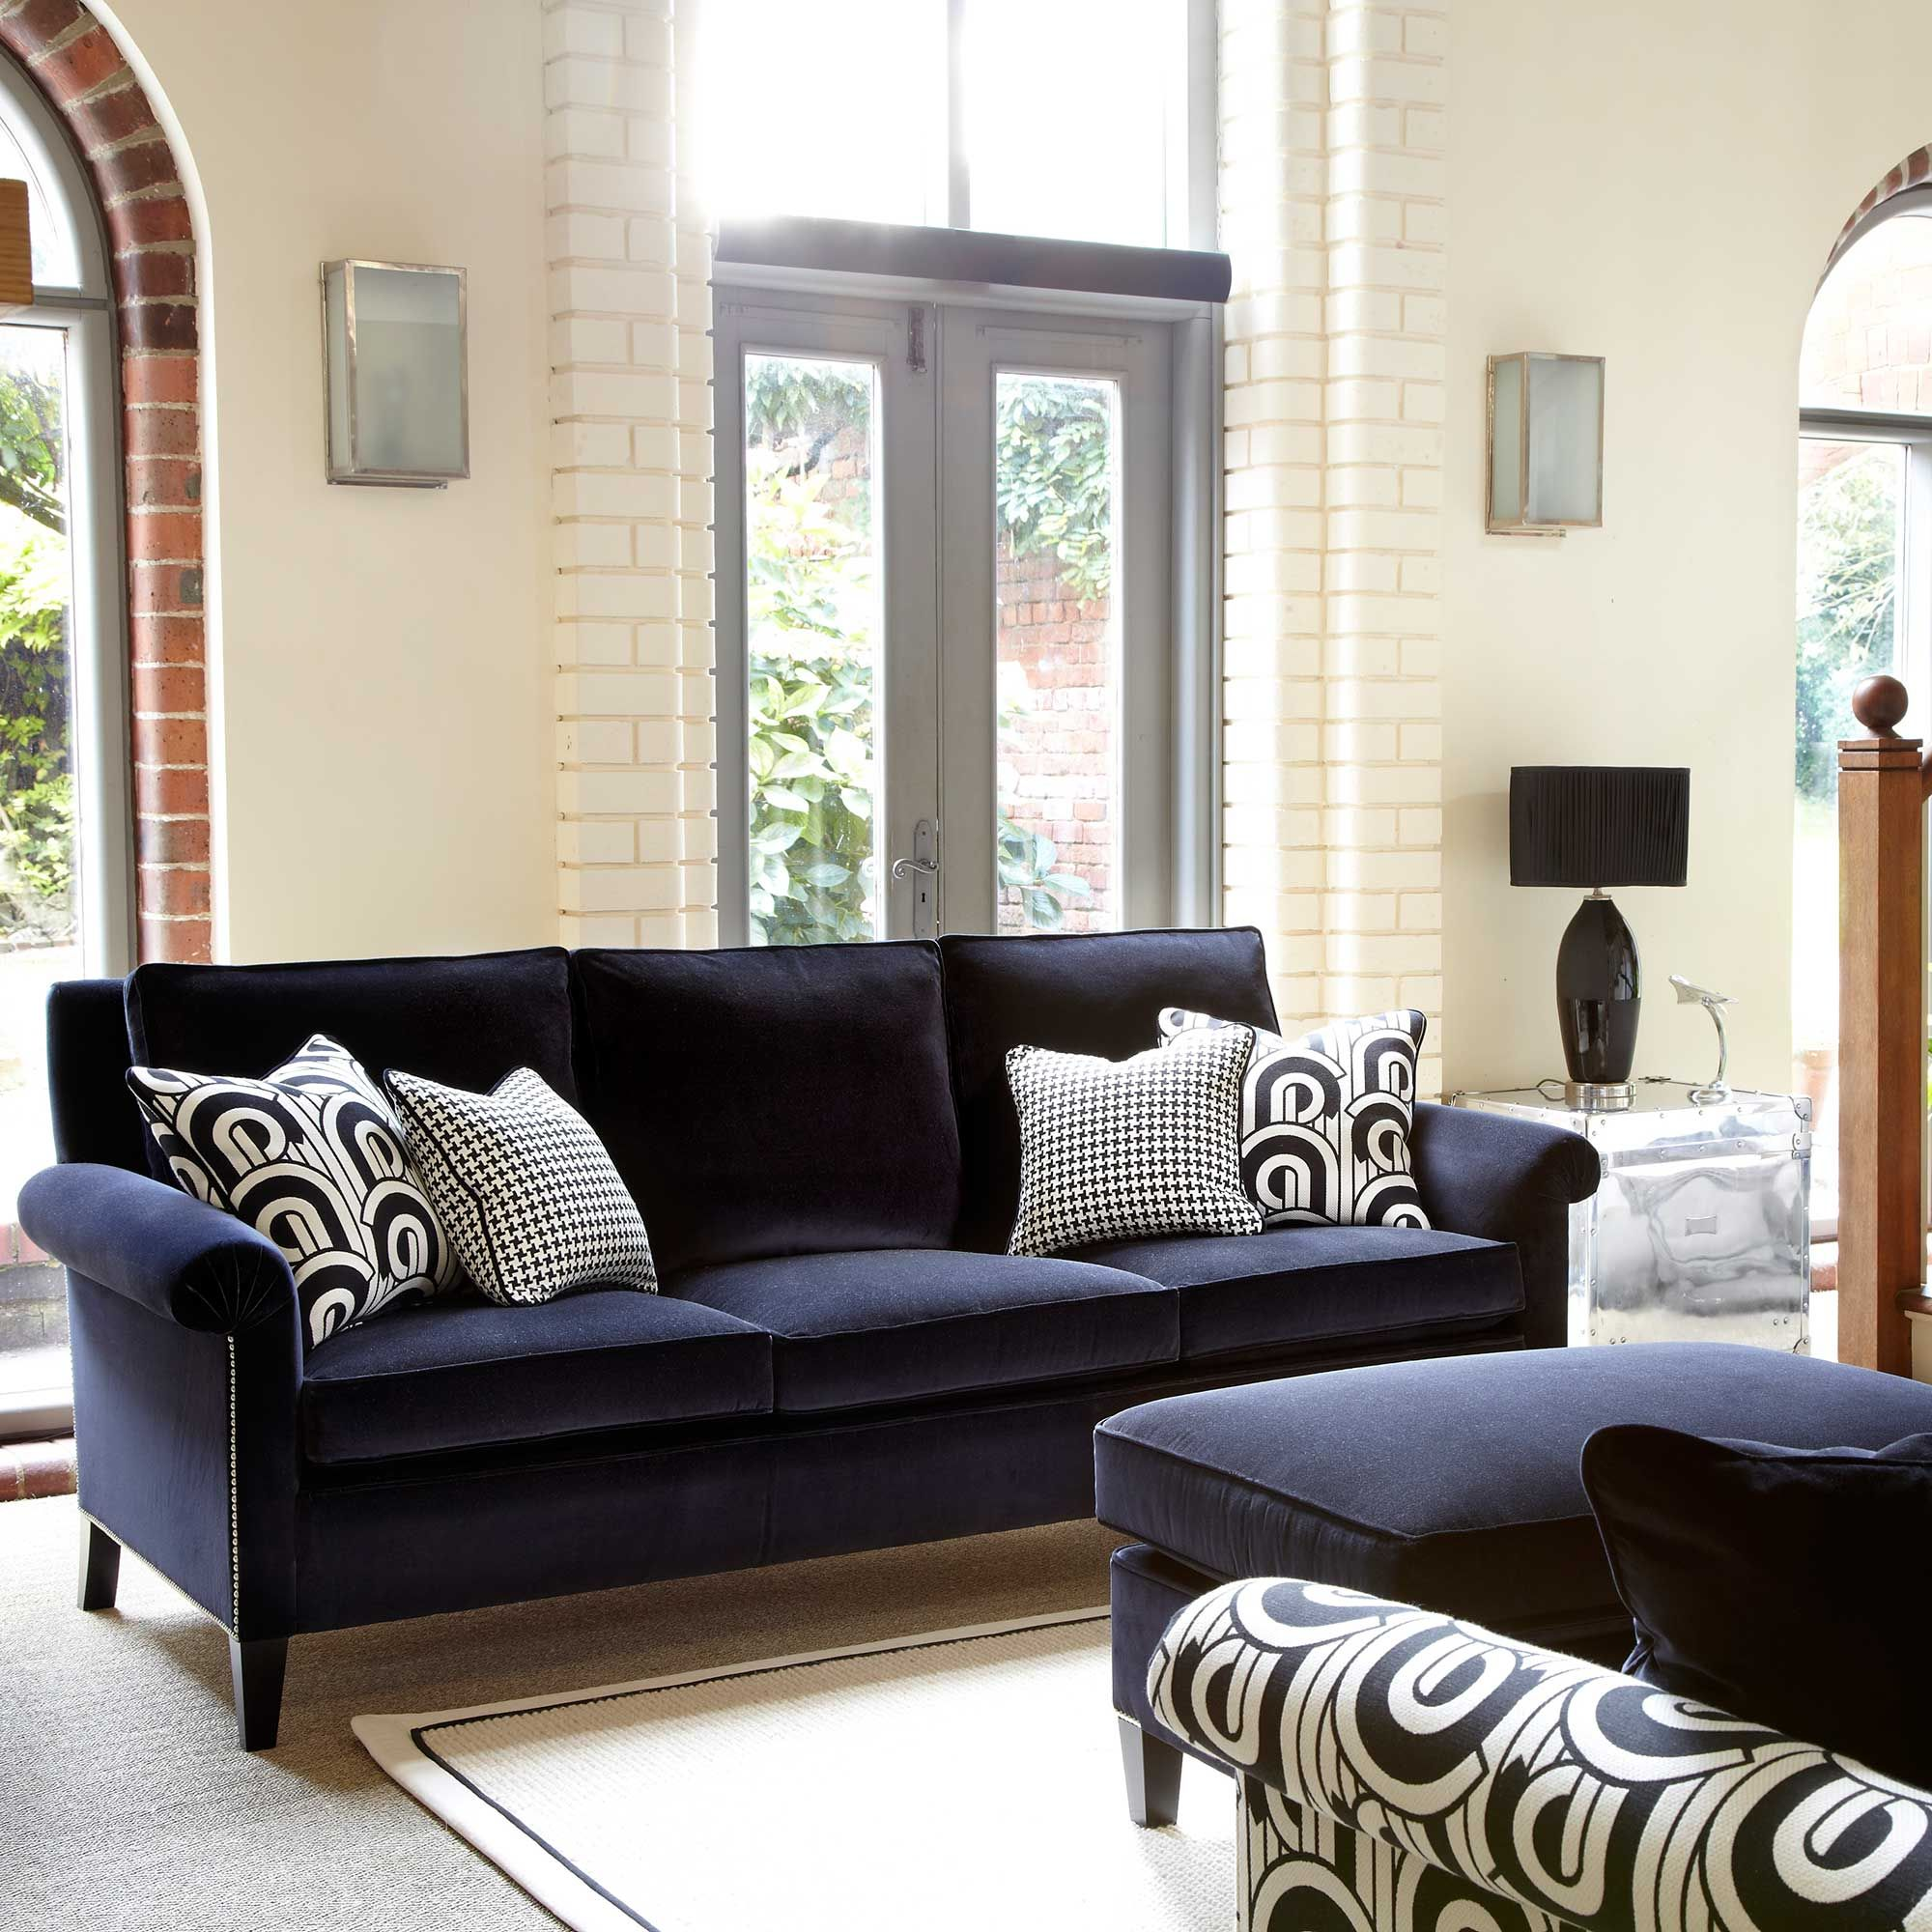 Gabrielle Living Room: Pin On Shopping List